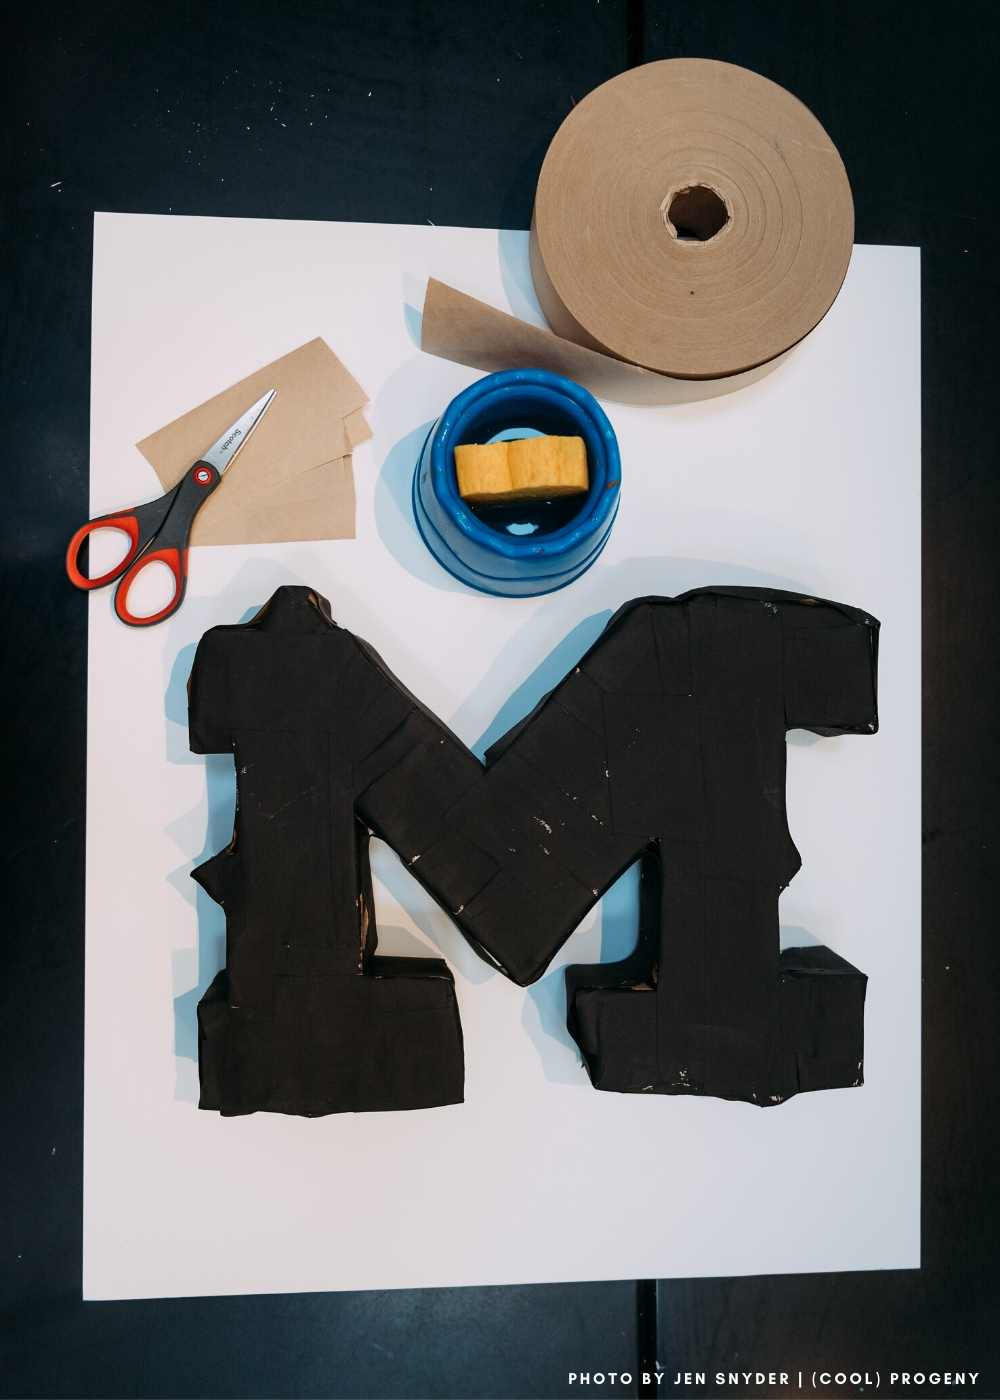 MAKE IT! 3D Letter Art - (cool) progeny